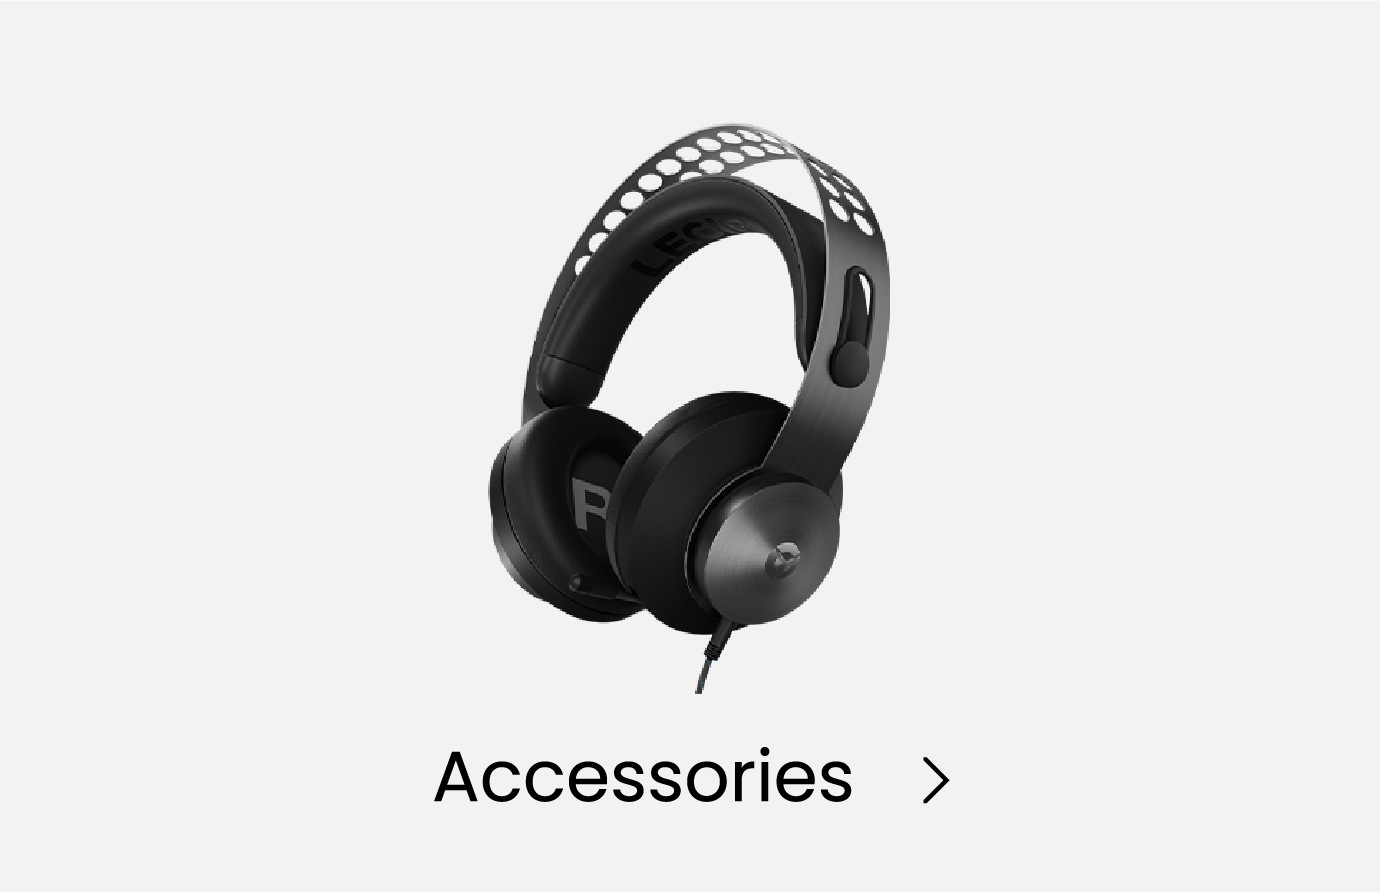 Medion Accessories